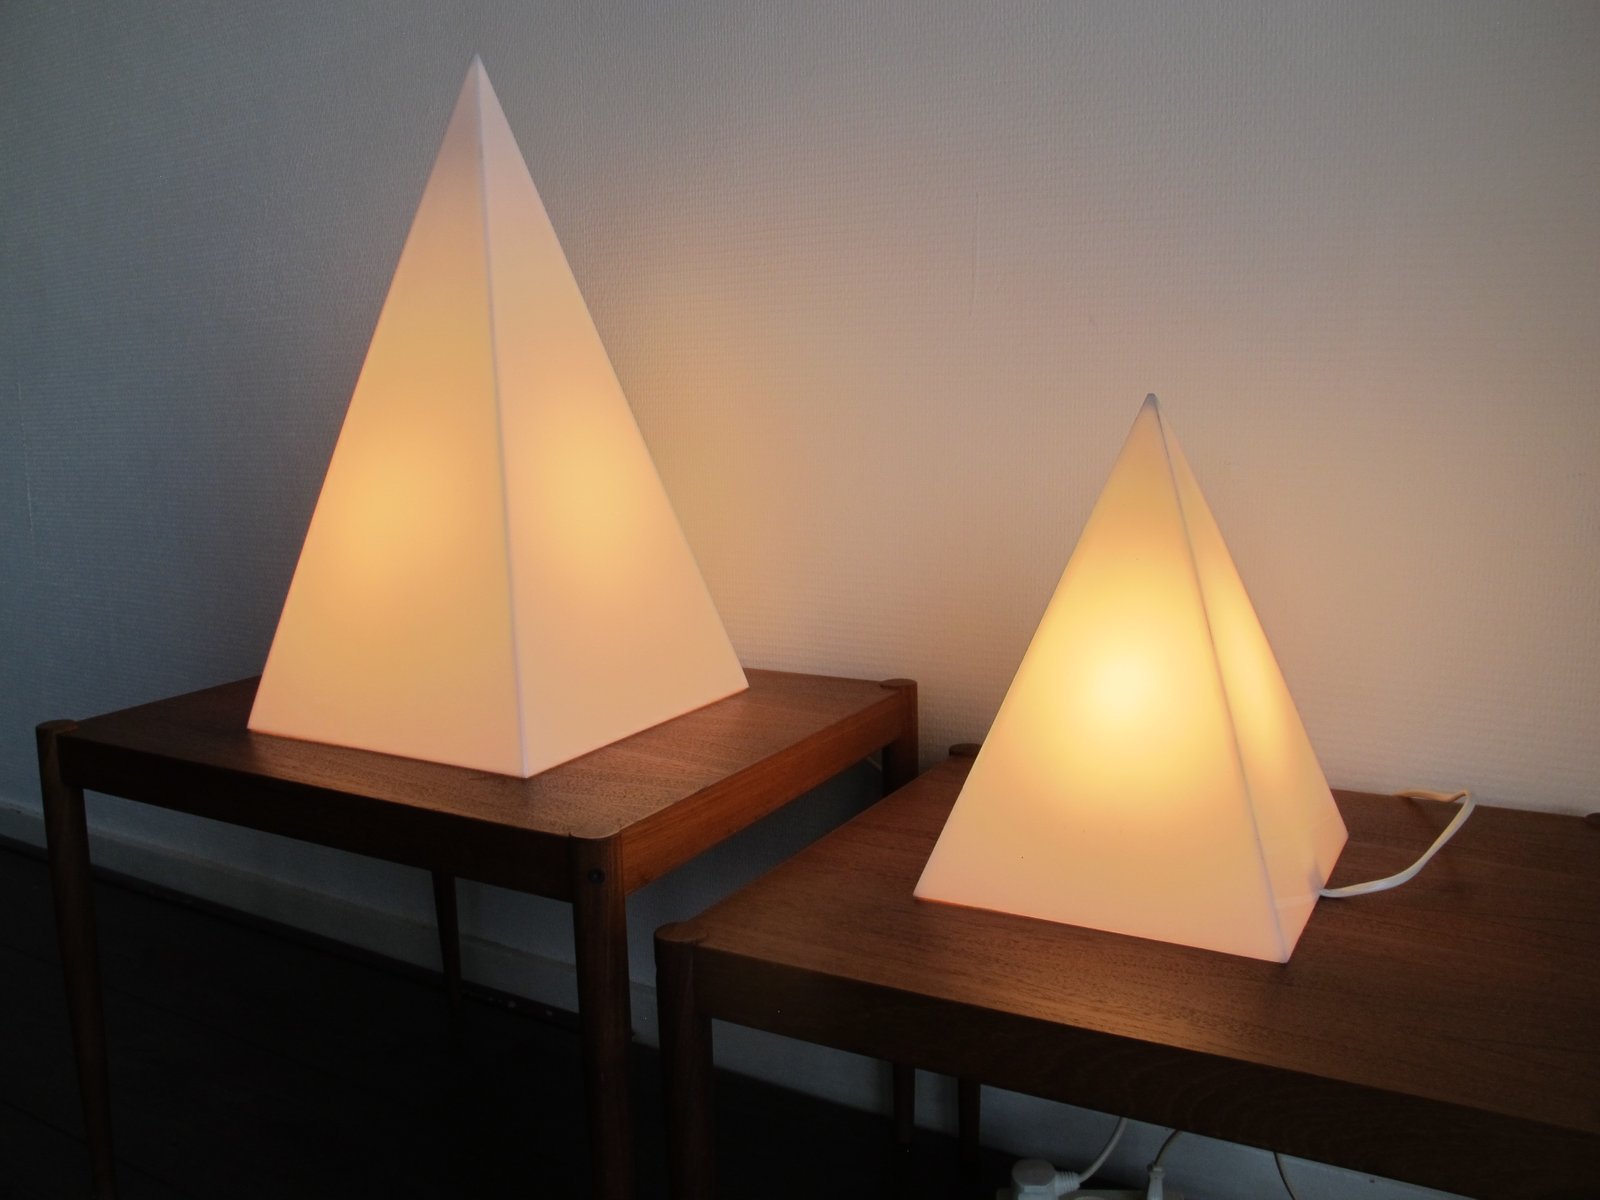 Vintage pyramiden lampen 1970er 2er set bei pamono kaufen for Lampen niederlande